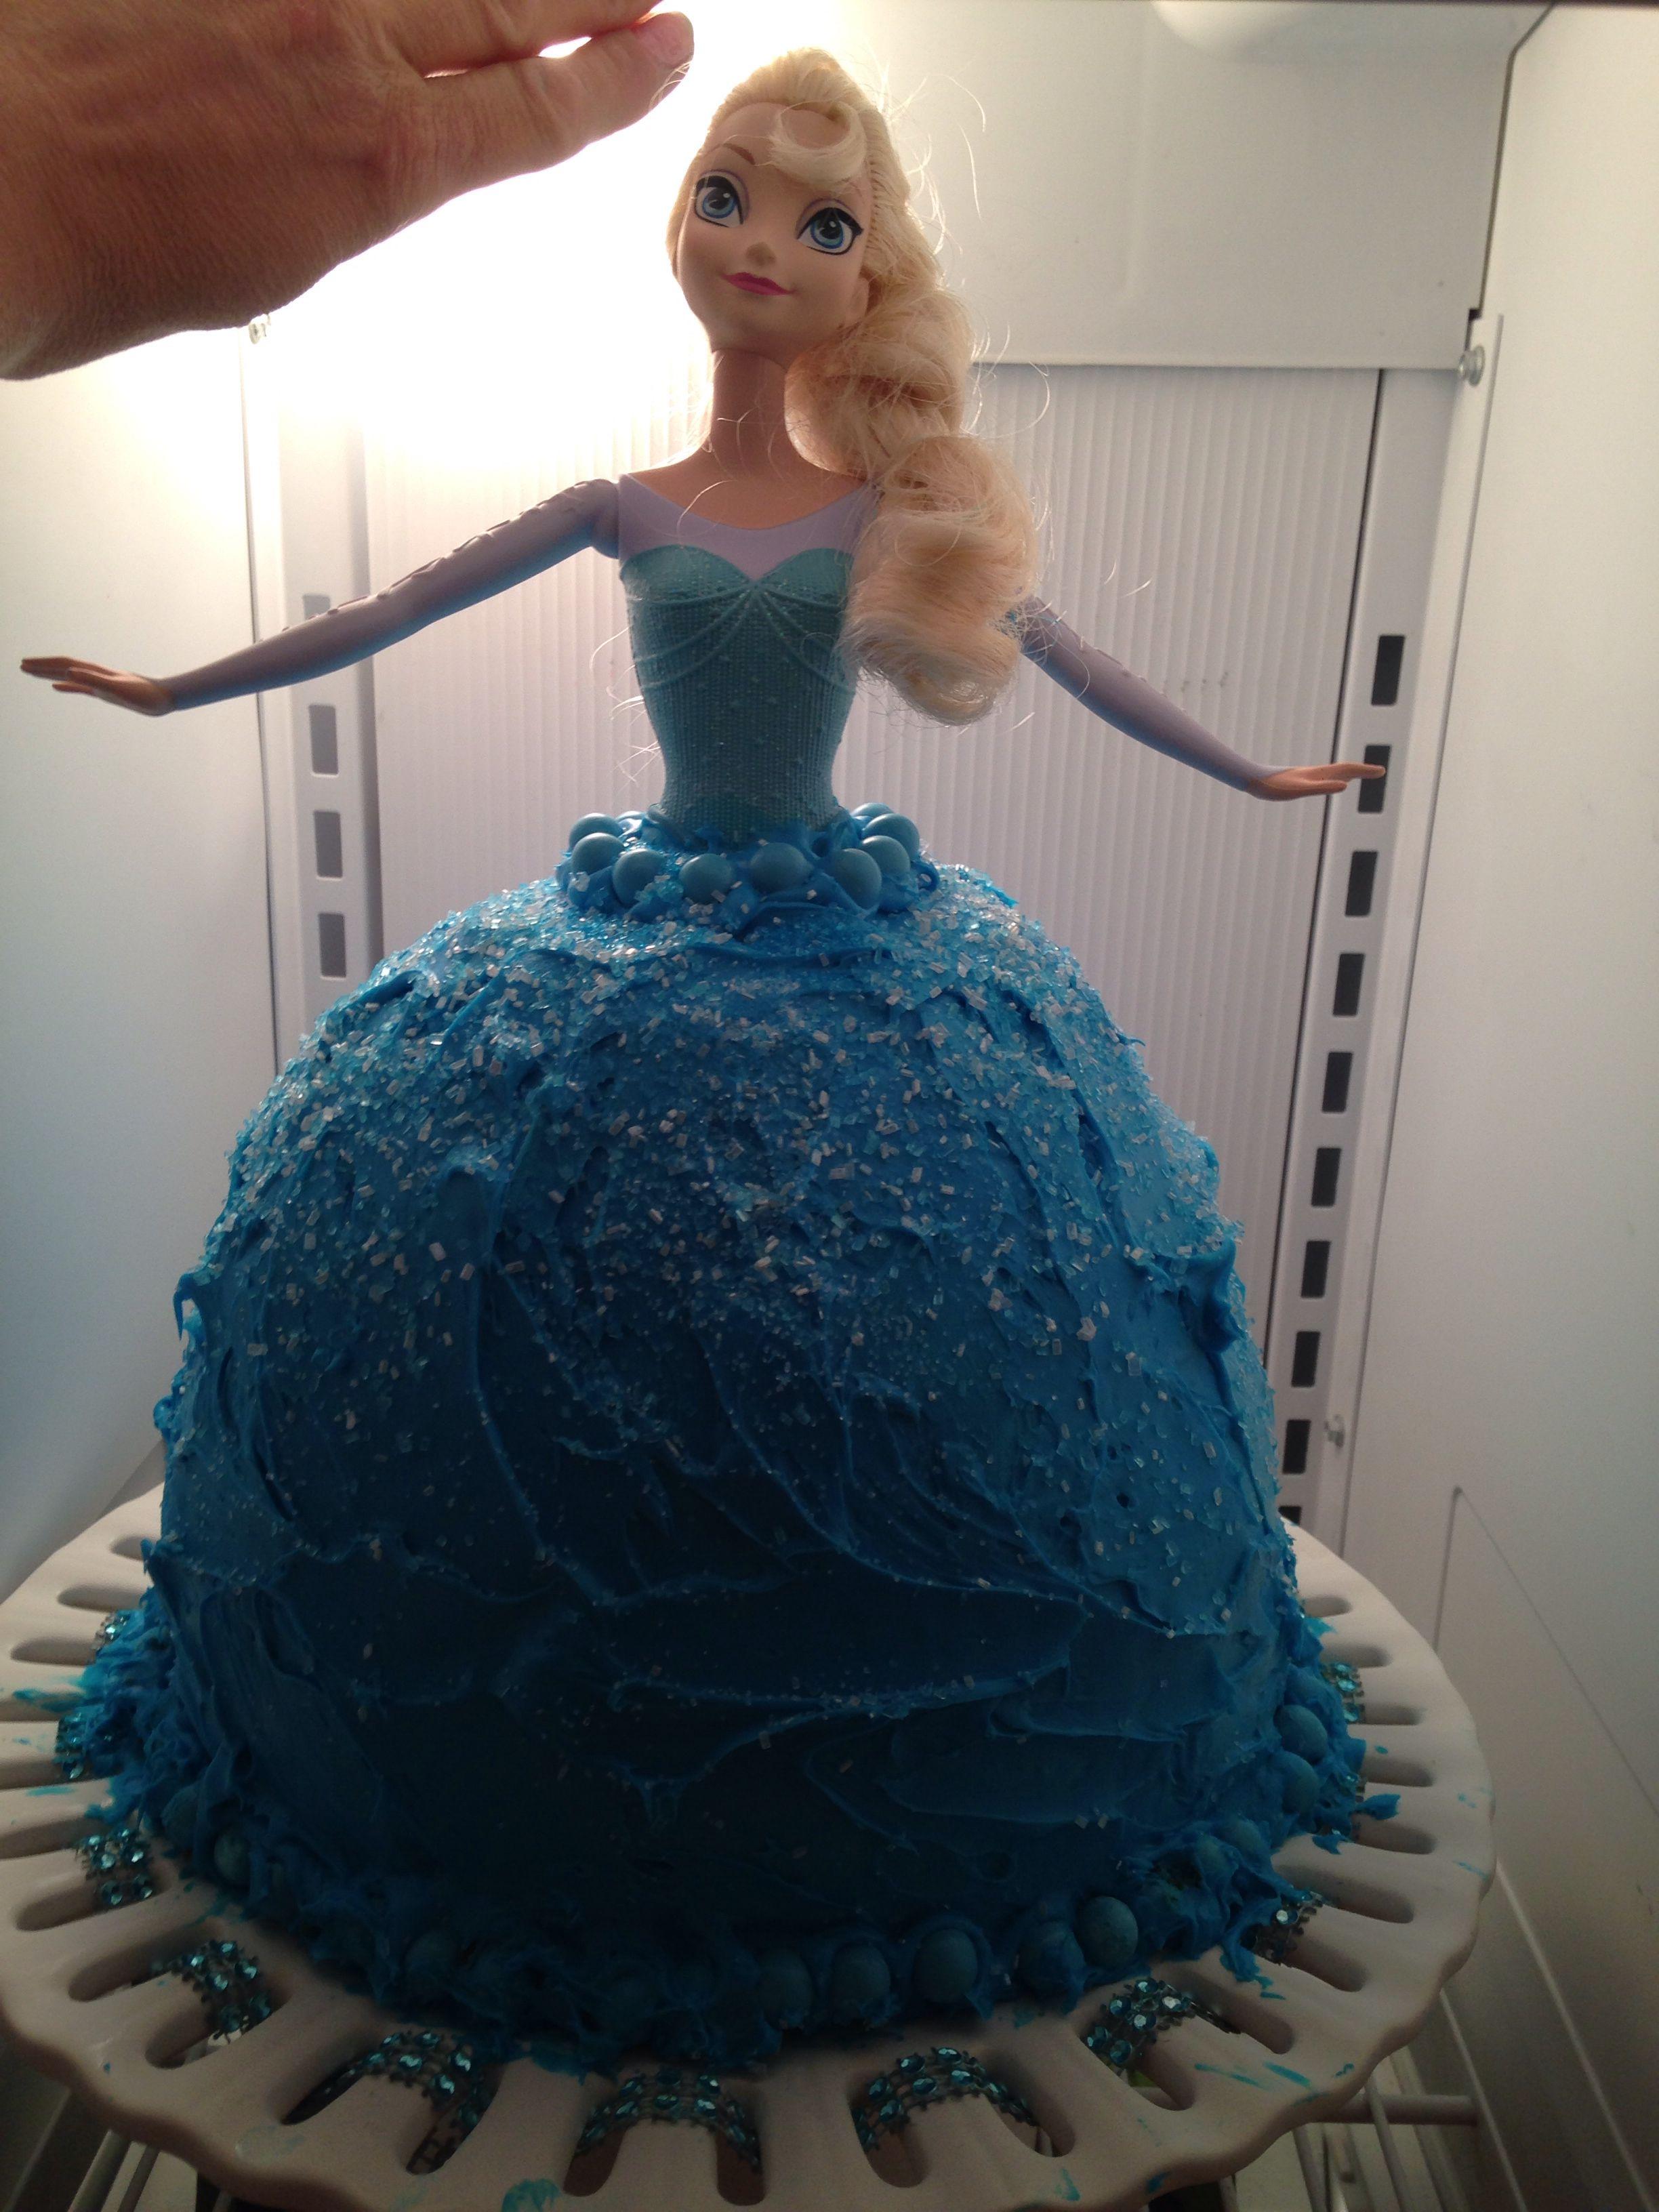 Disney frozen queen elsa cake princess cake barbie cake